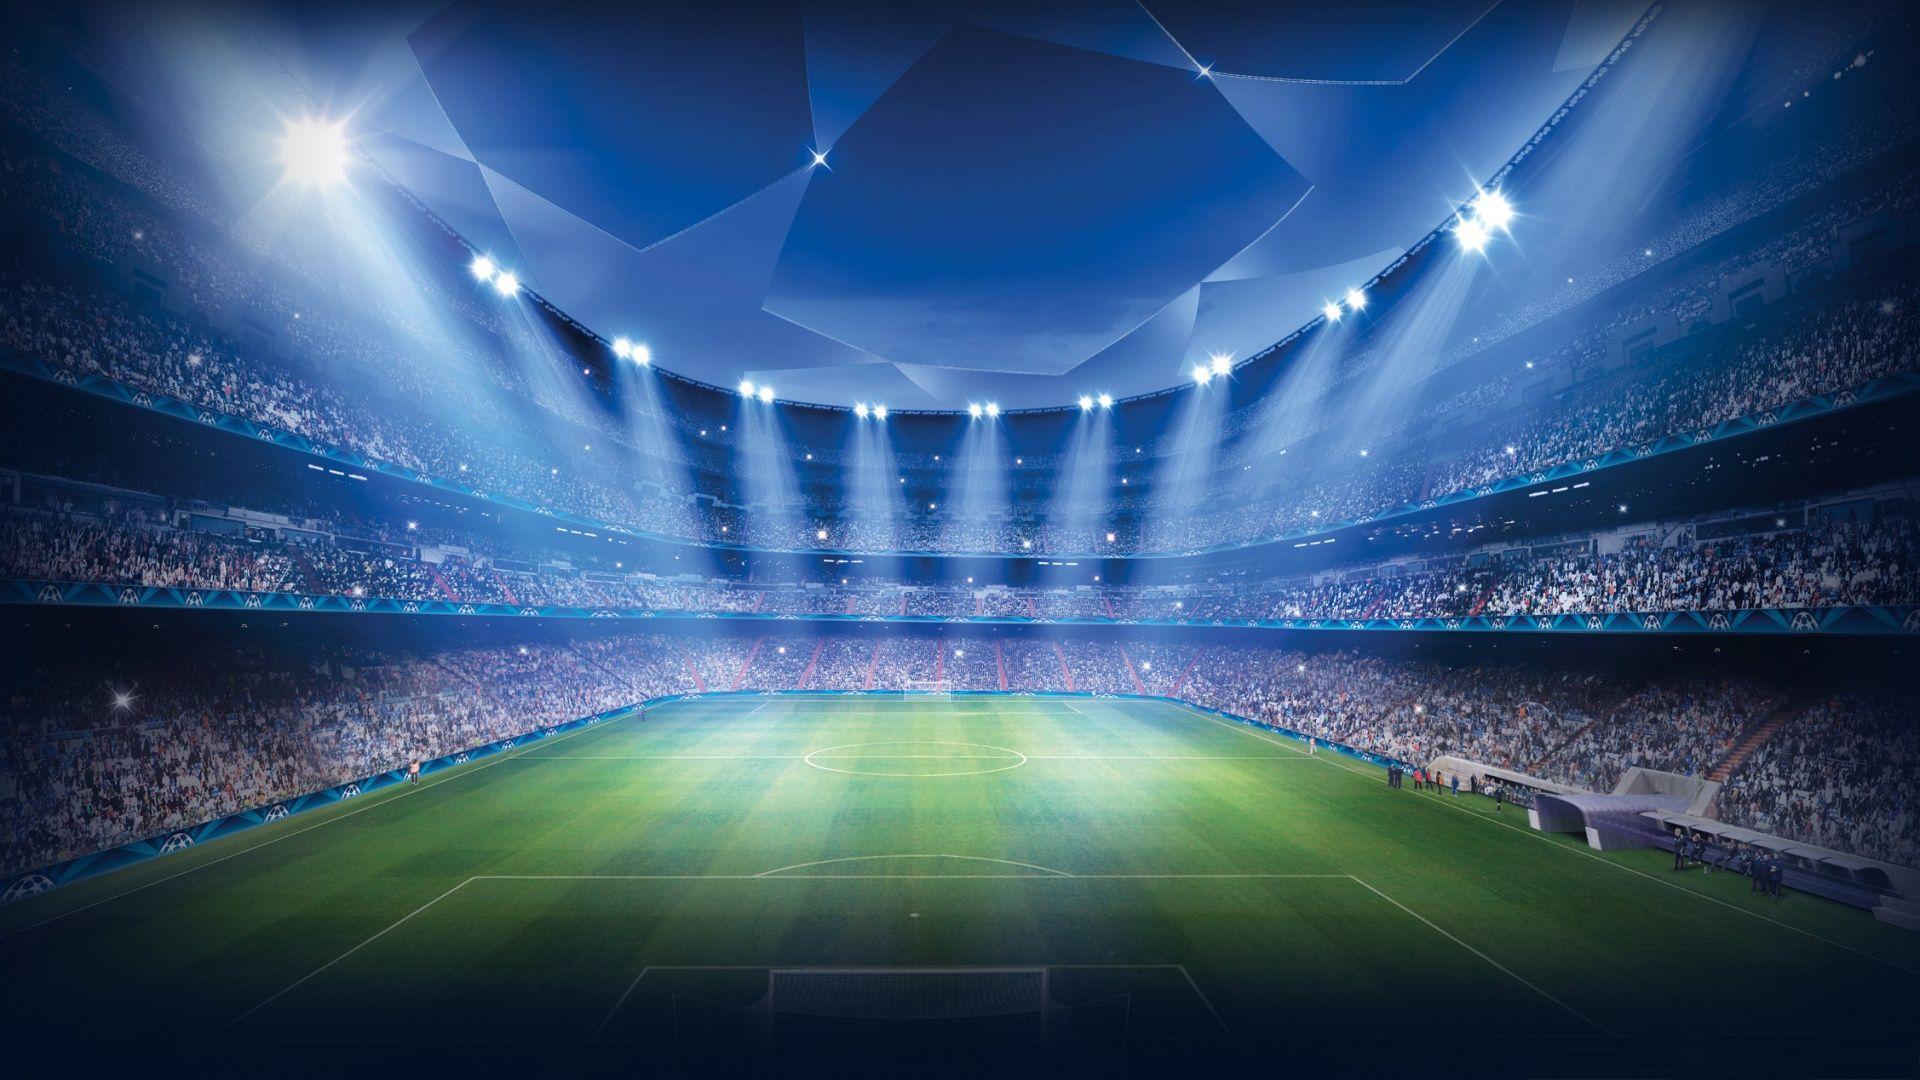 Beautiful Moderni nogometni stadion Wallpaper HD Pozadine